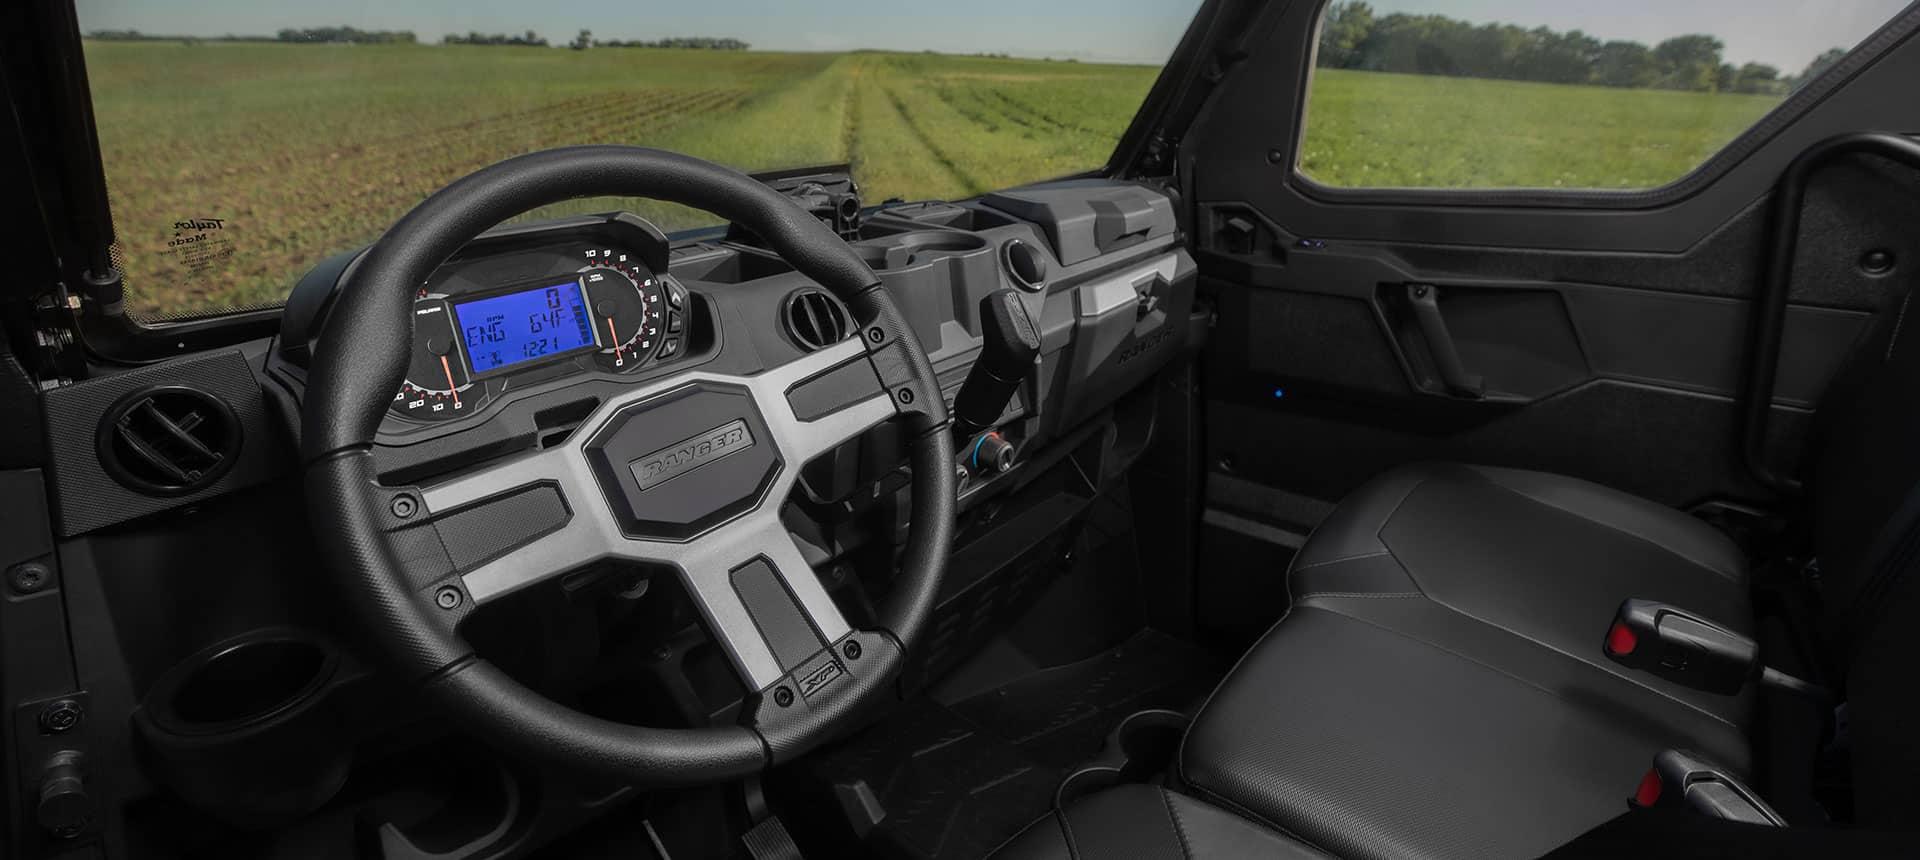 Lækker instrumentering i POlaris Ranger XP 1000 crew. UTV til arbejde og fritid